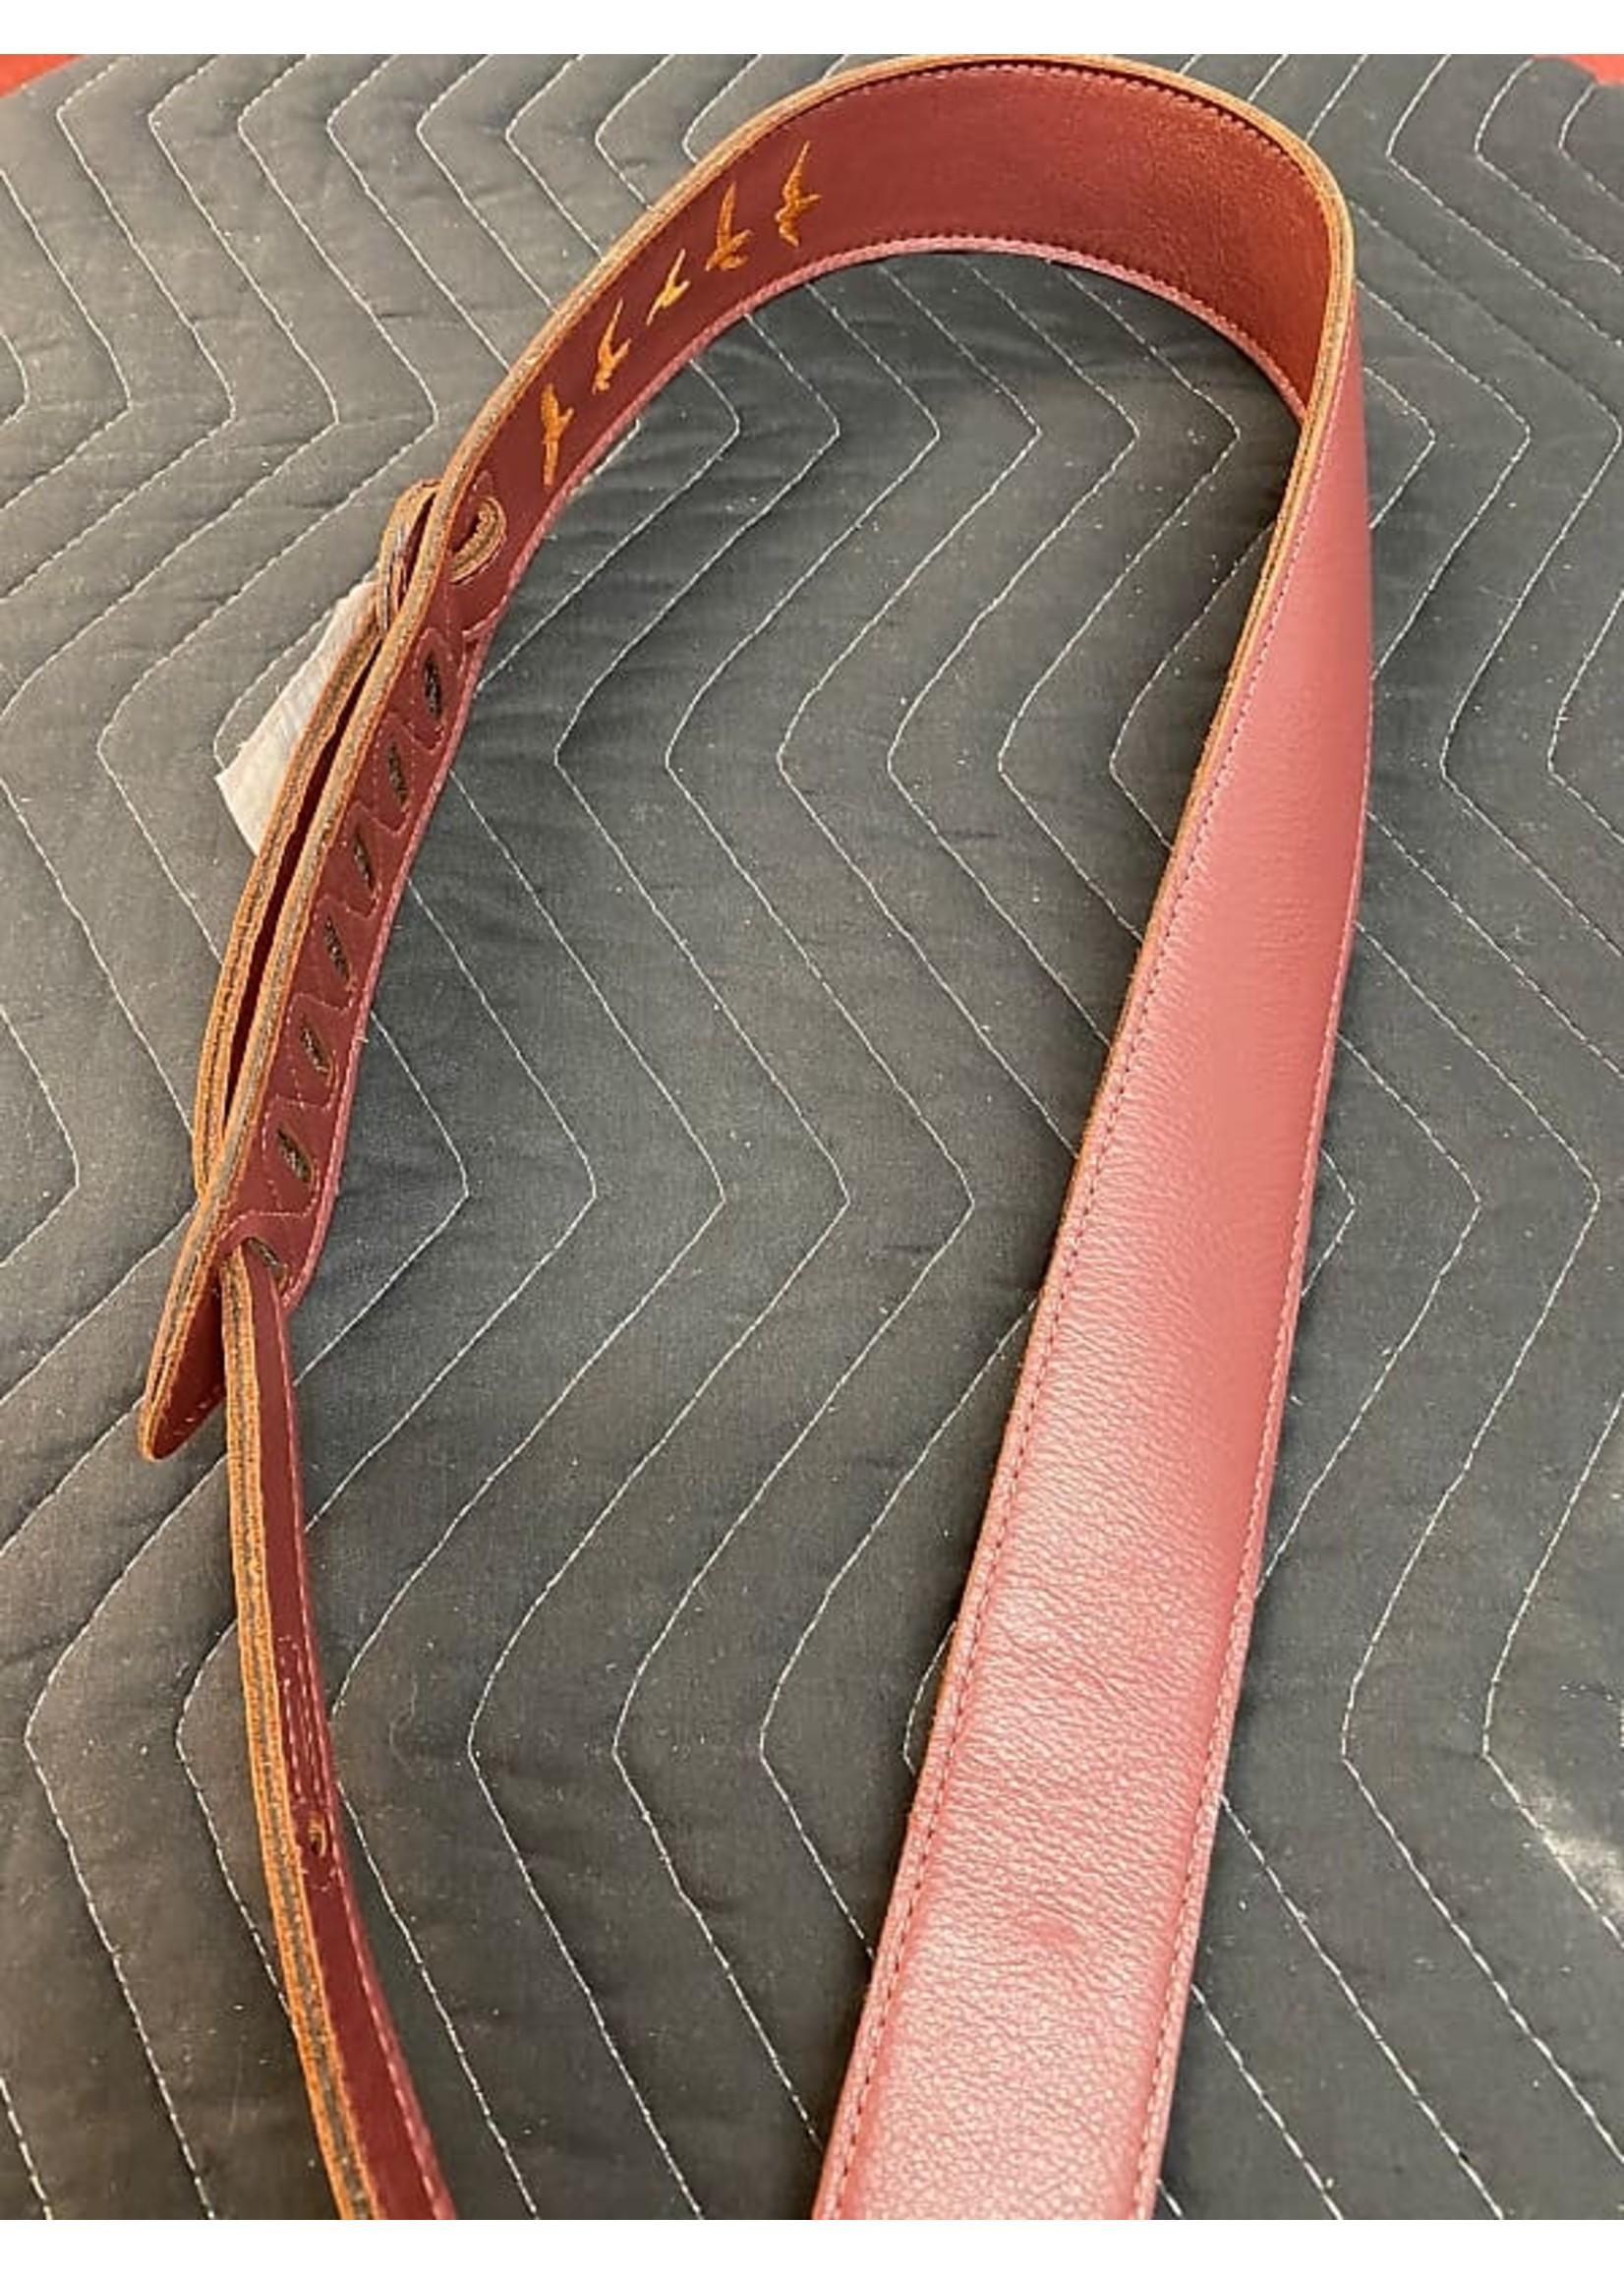 Paul Reed Smith PRS Premium Leather Strap - Burgundy